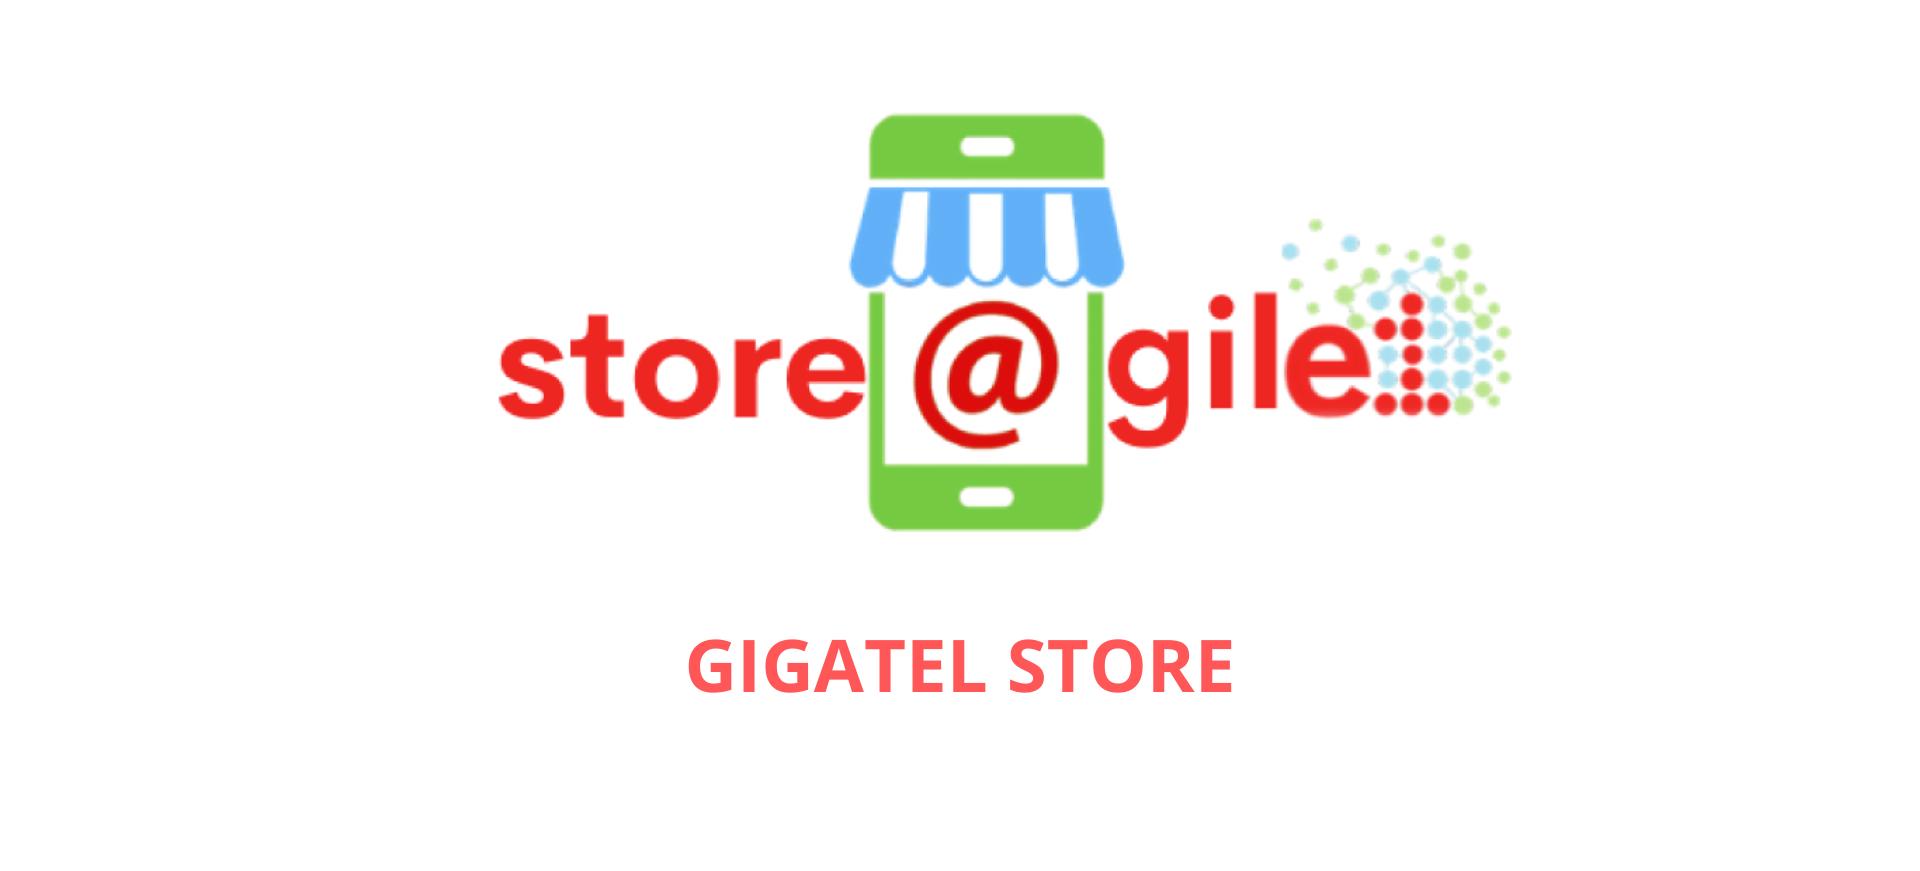 Gigatel Store